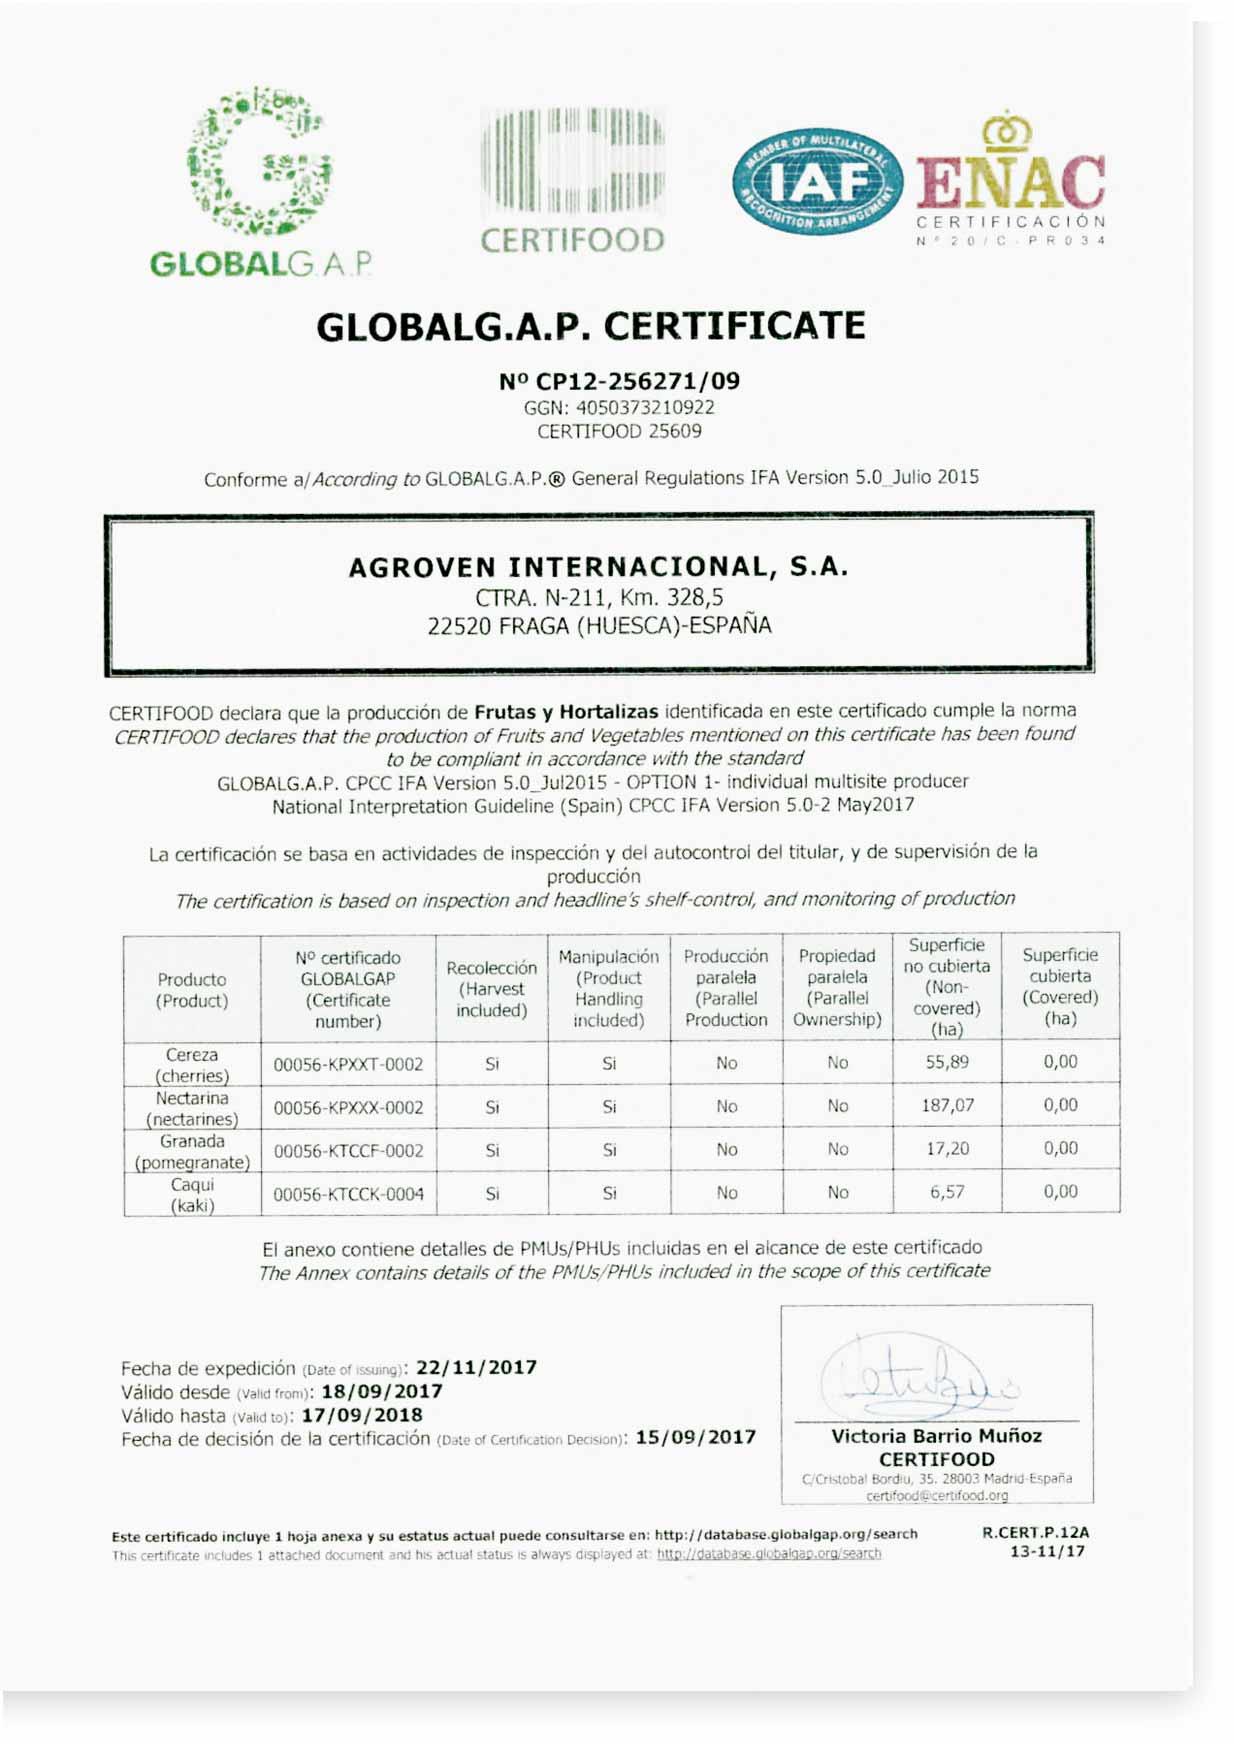 Certificado-G.A.P. G.A.P-Certificate. Agroven International.